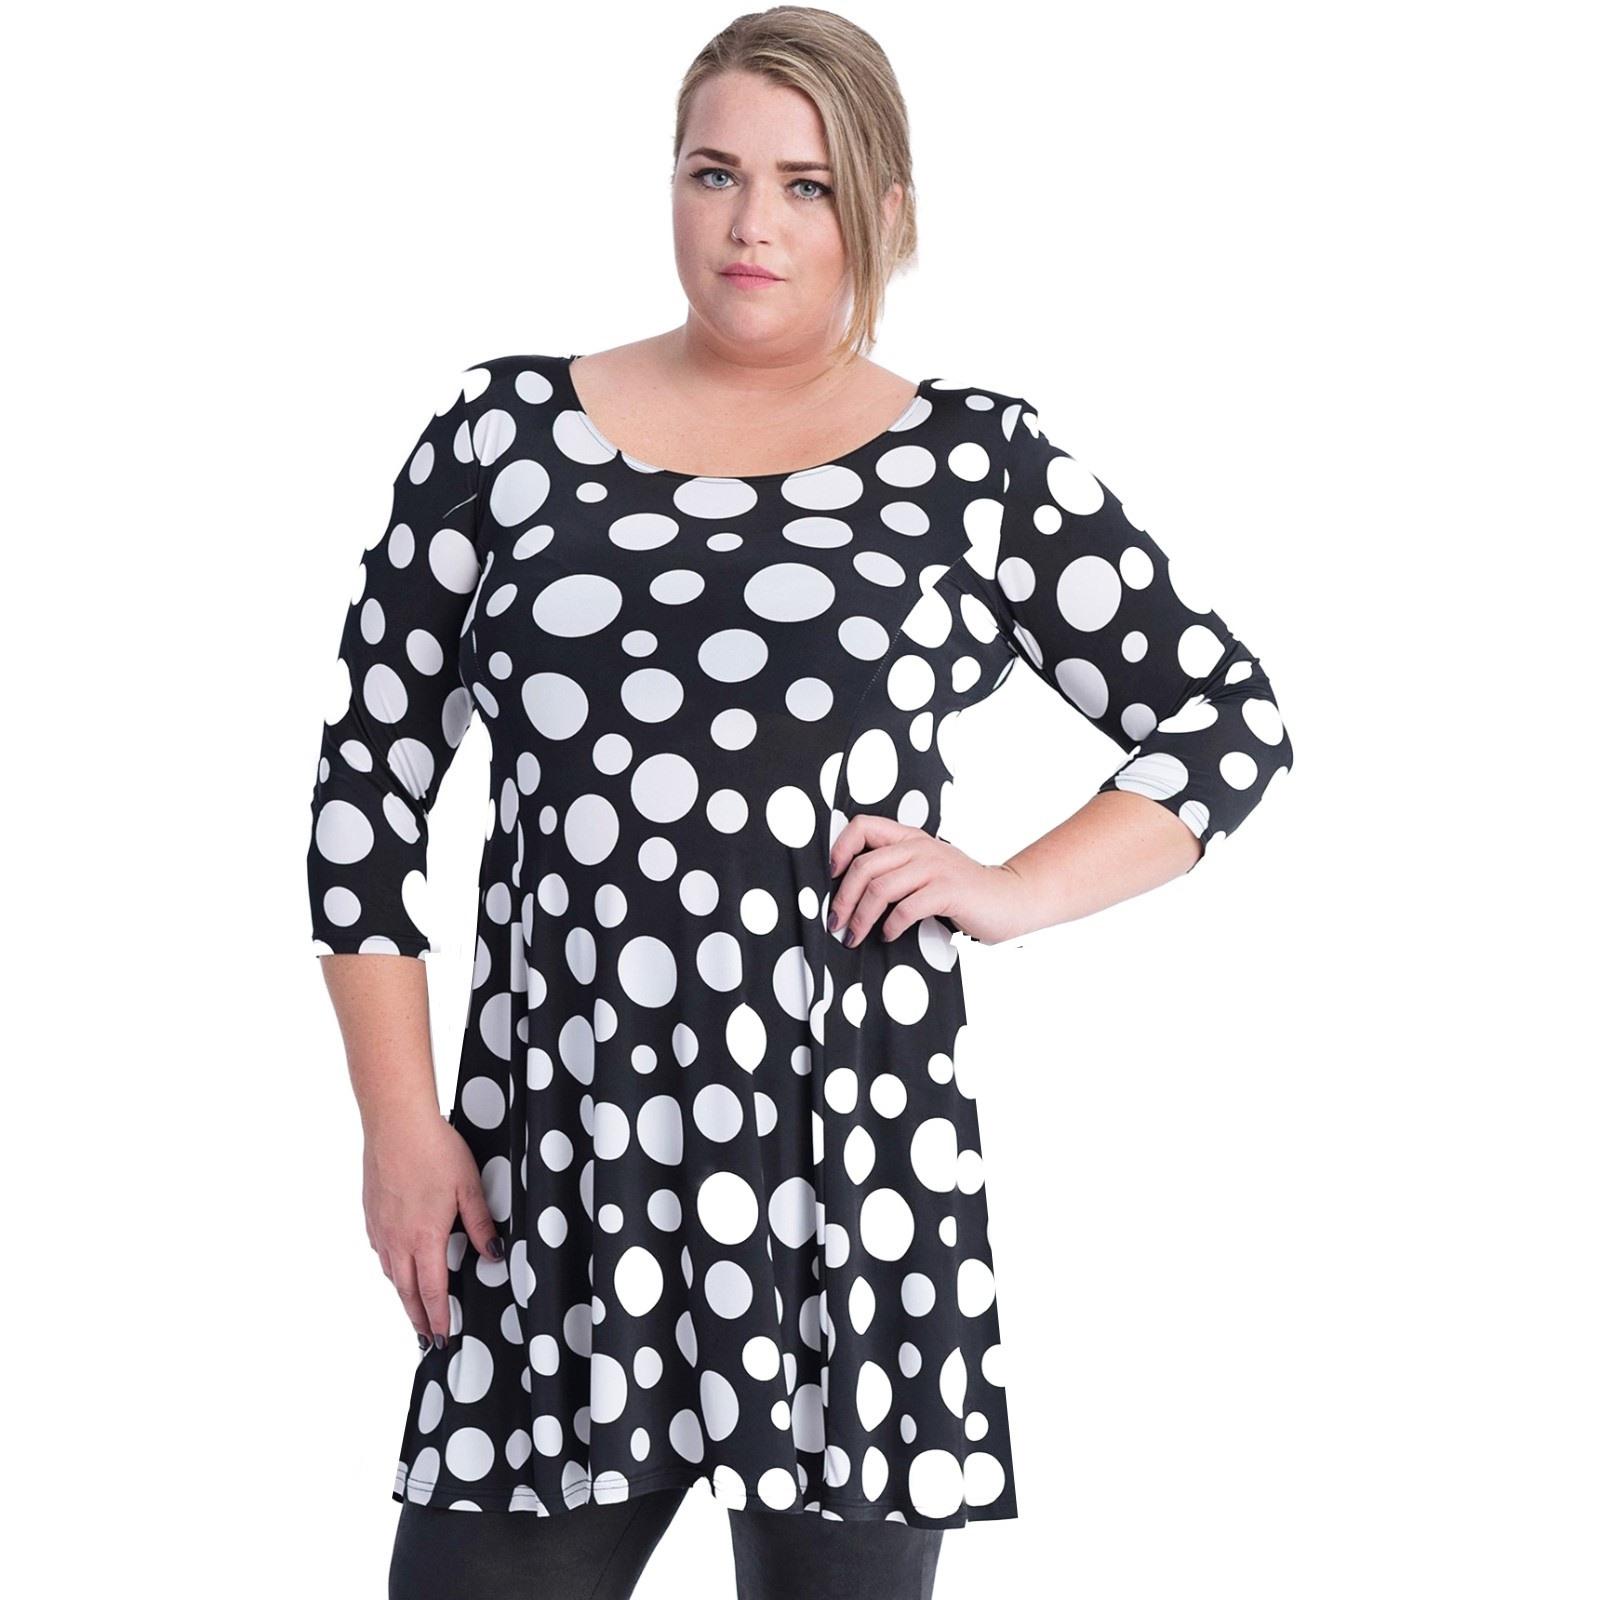 13 Großartig Damen Kleider A Form Vertrieb Genial Damen Kleider A Form Spezialgebiet